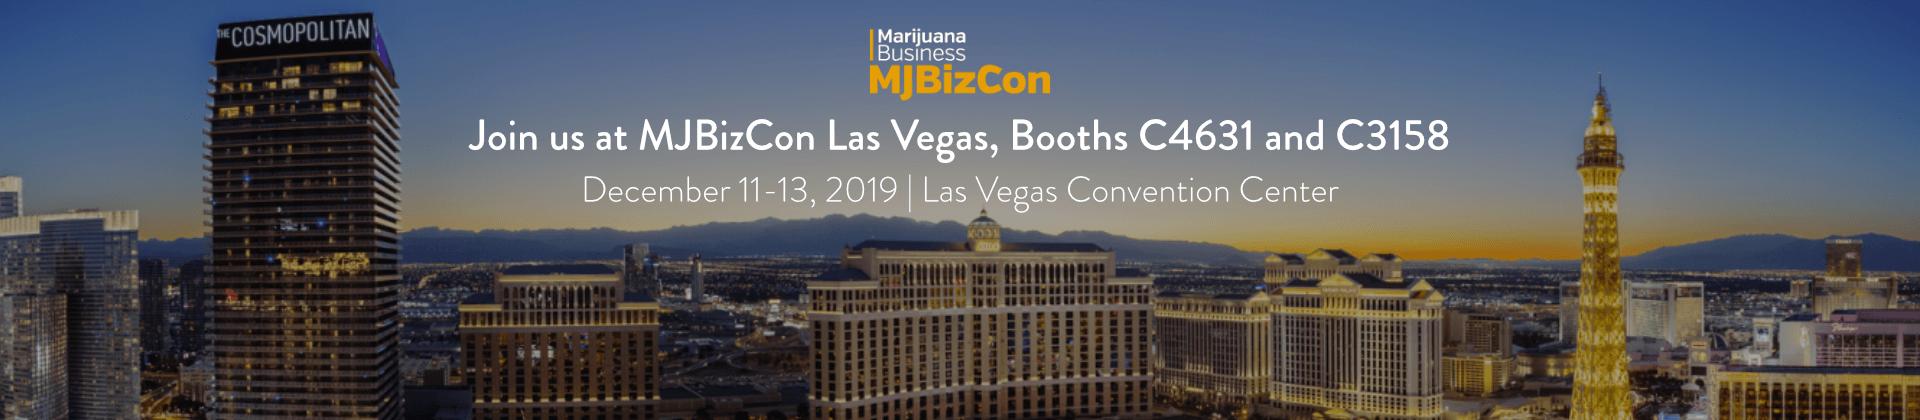 Meet us at MjBizCon Las Vegas, Booths C4631 & C3158.